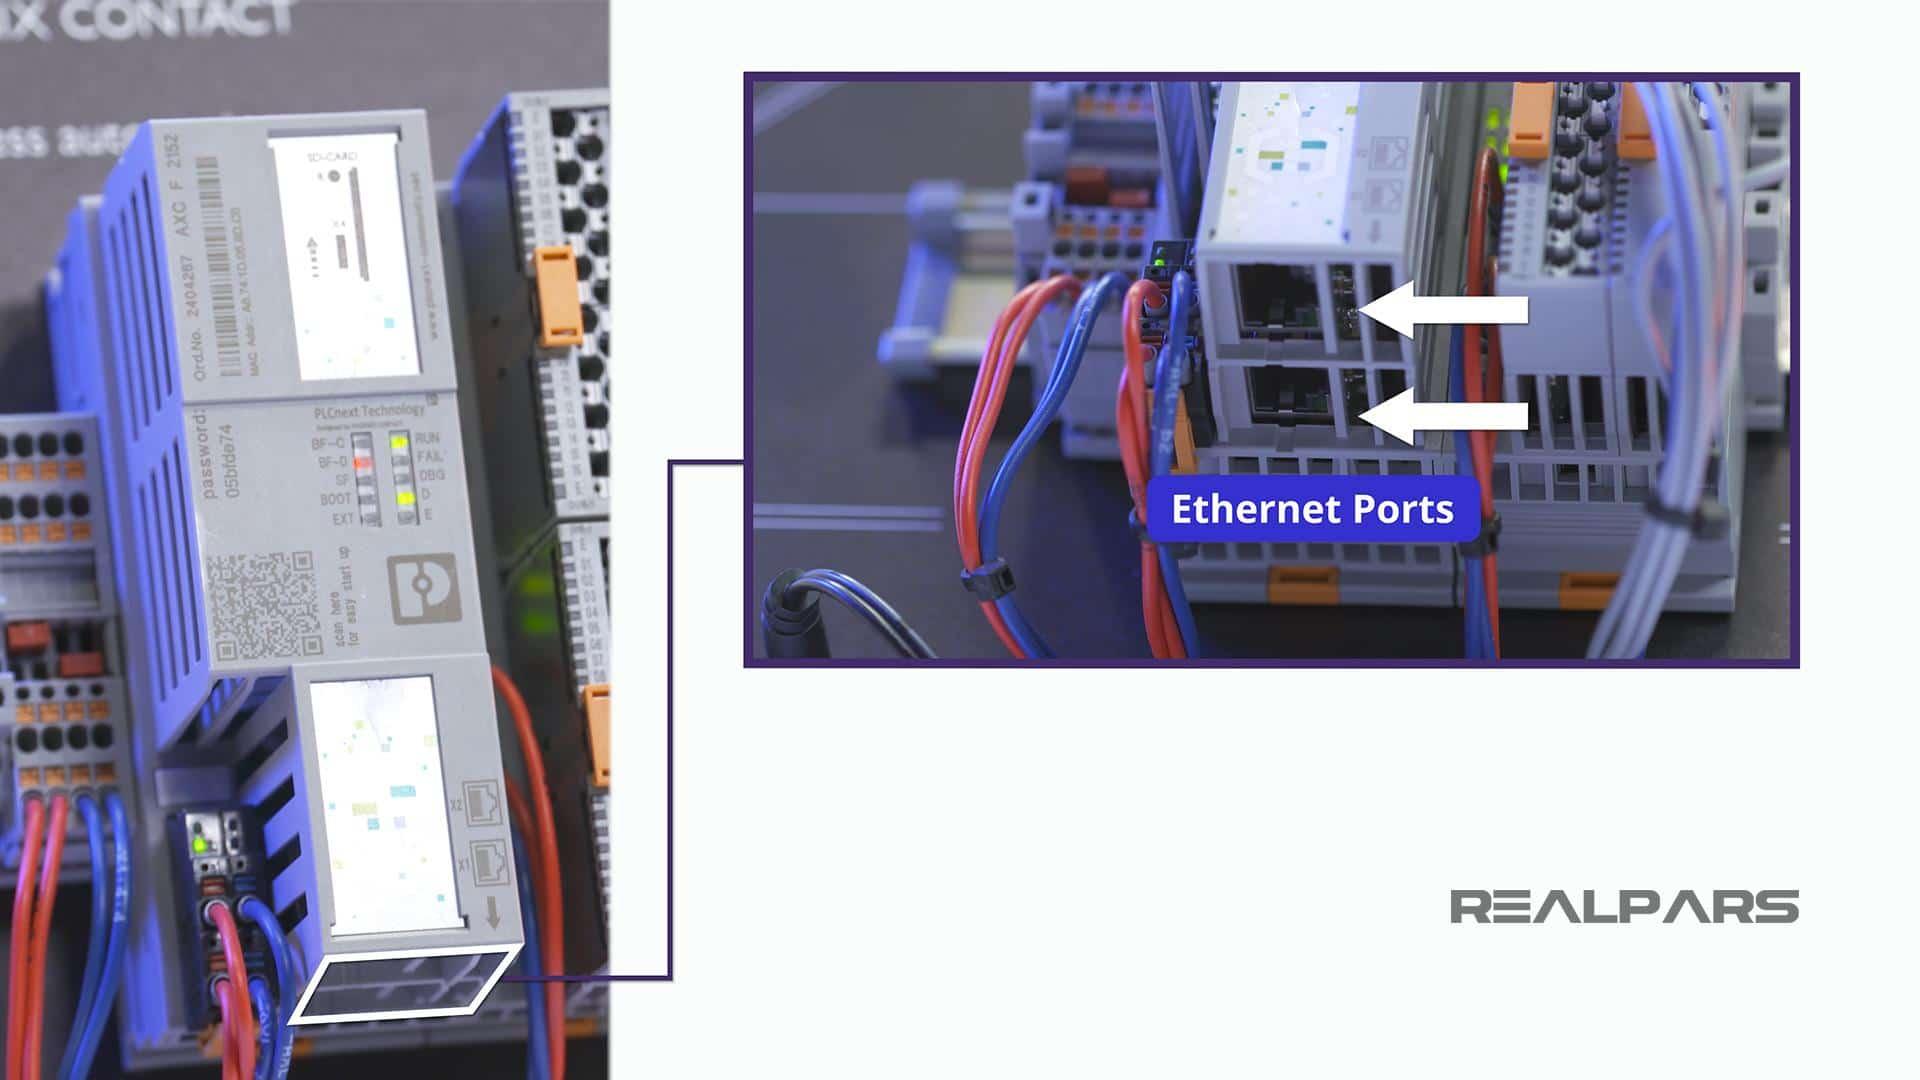 Controller Ethernet ports